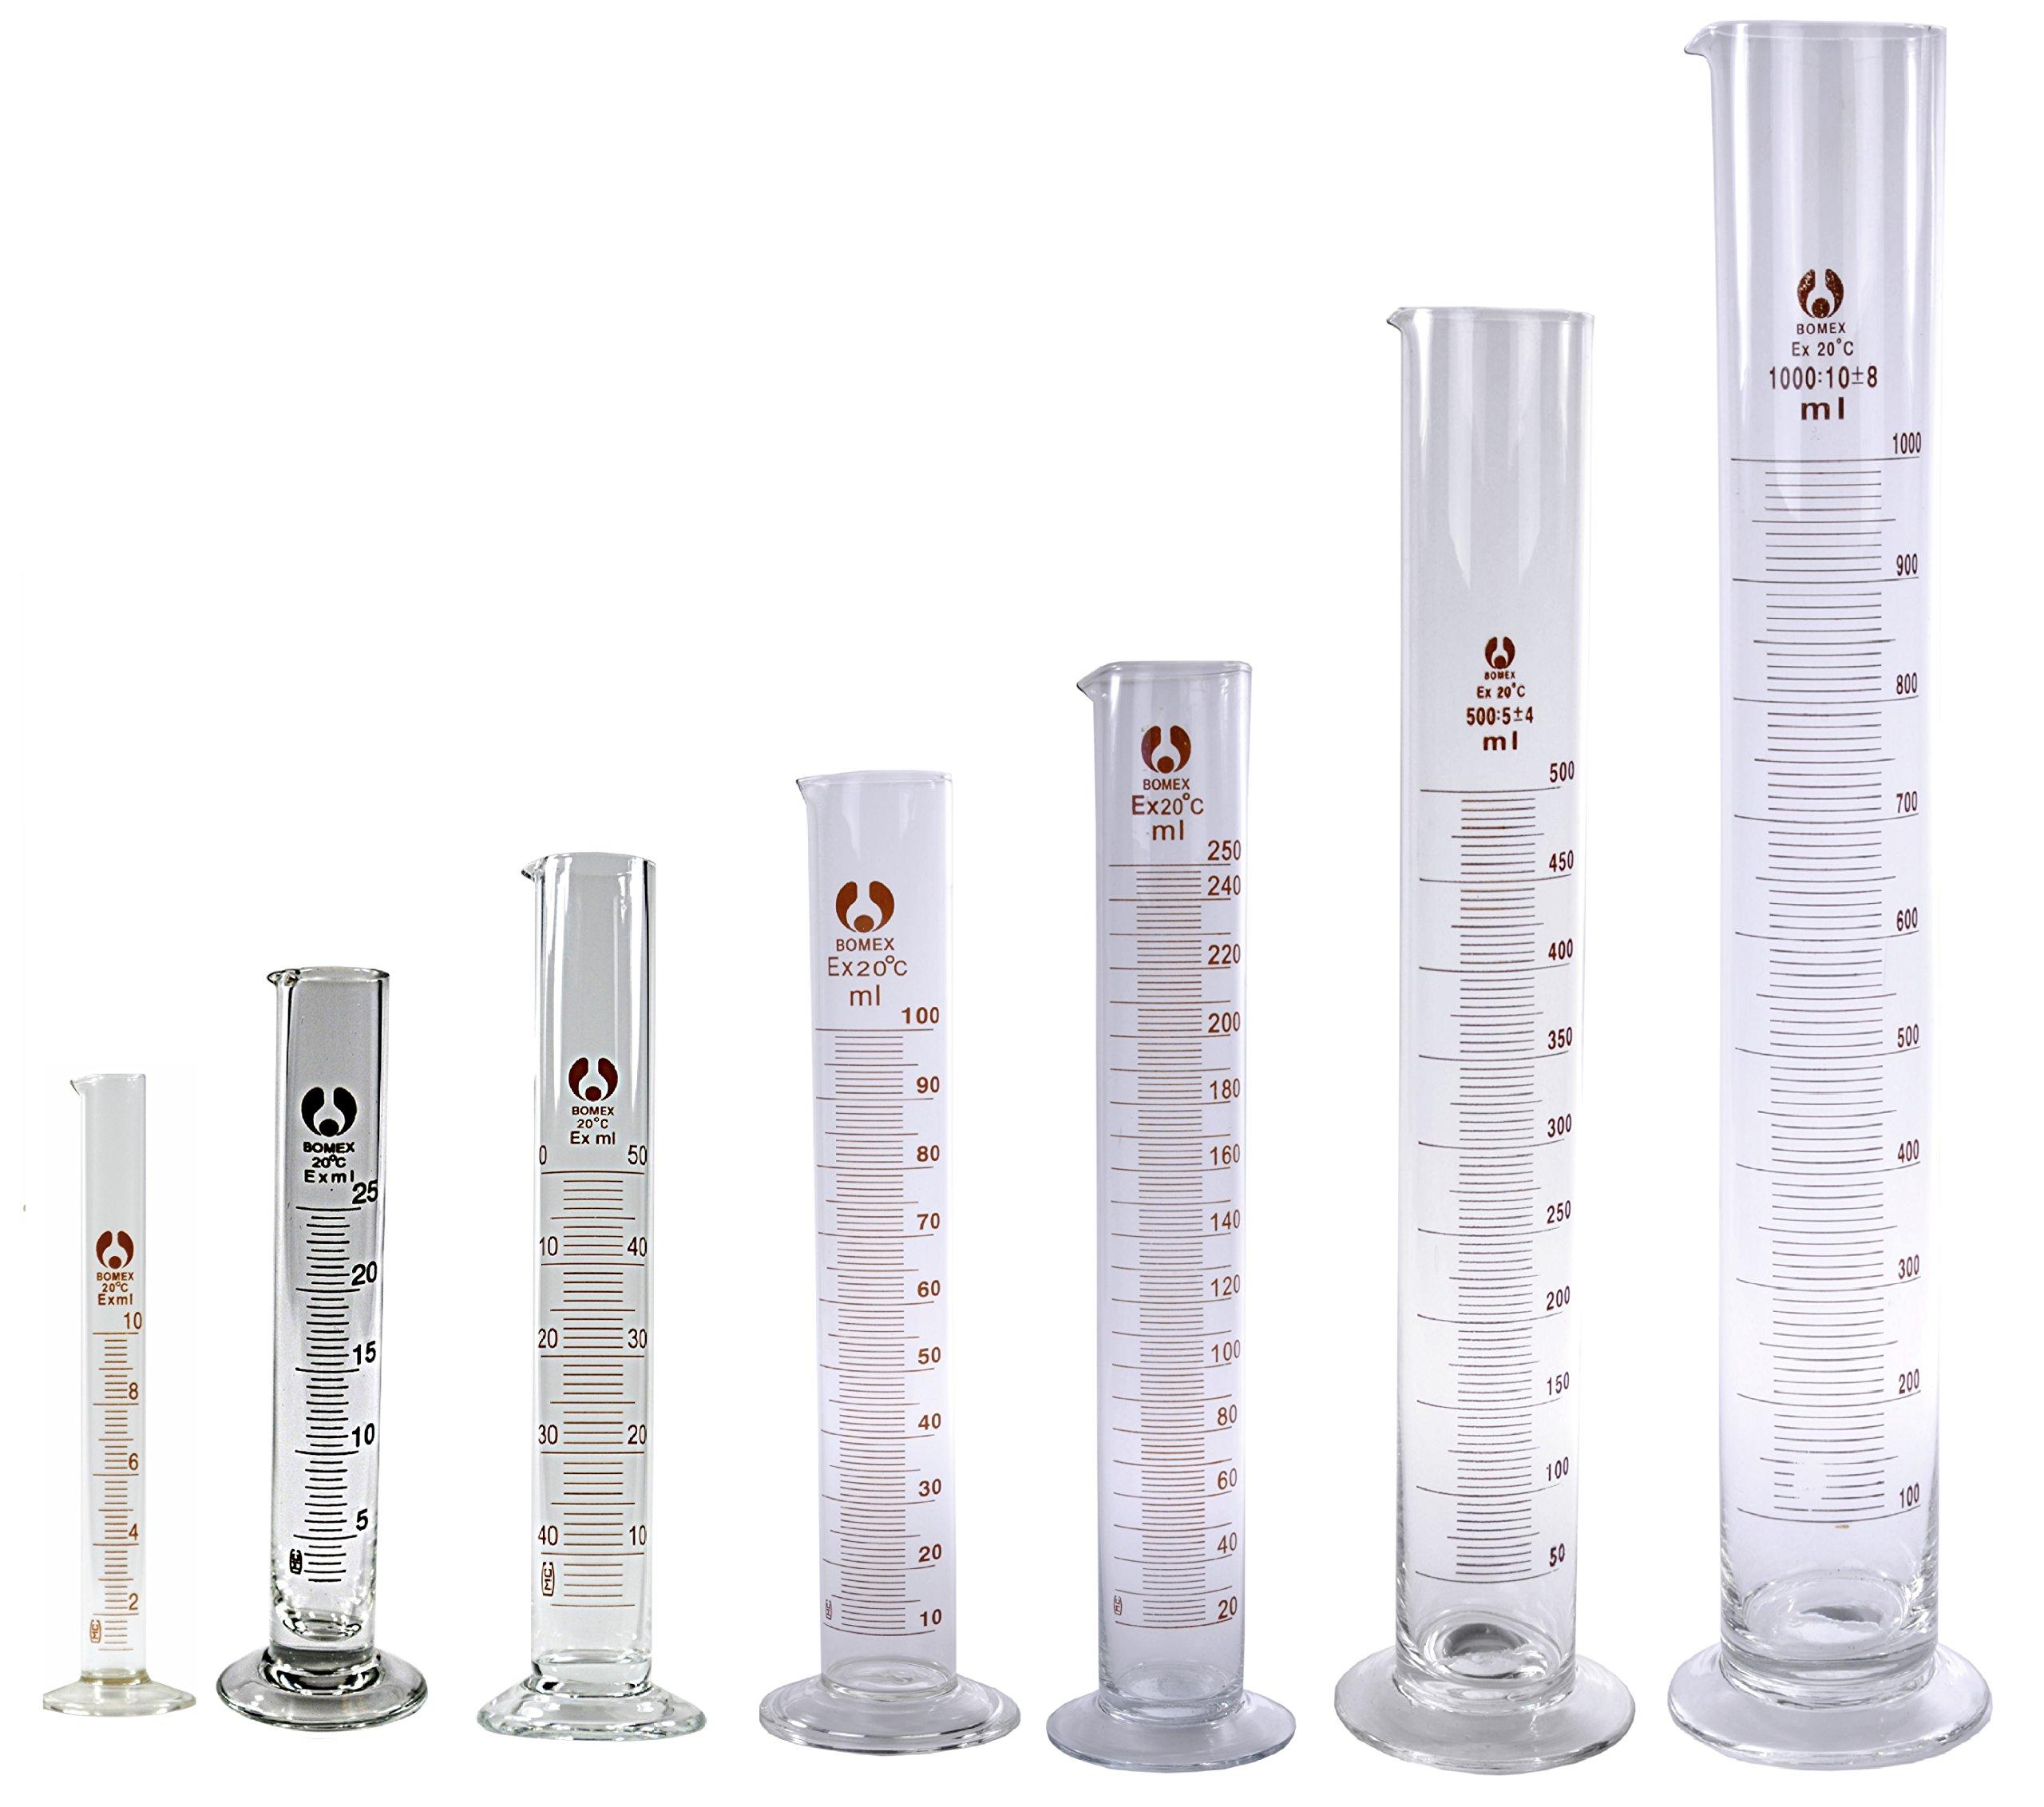 7 Glass Graduated Cylinders 10 25 50 100 250 500 1000mL